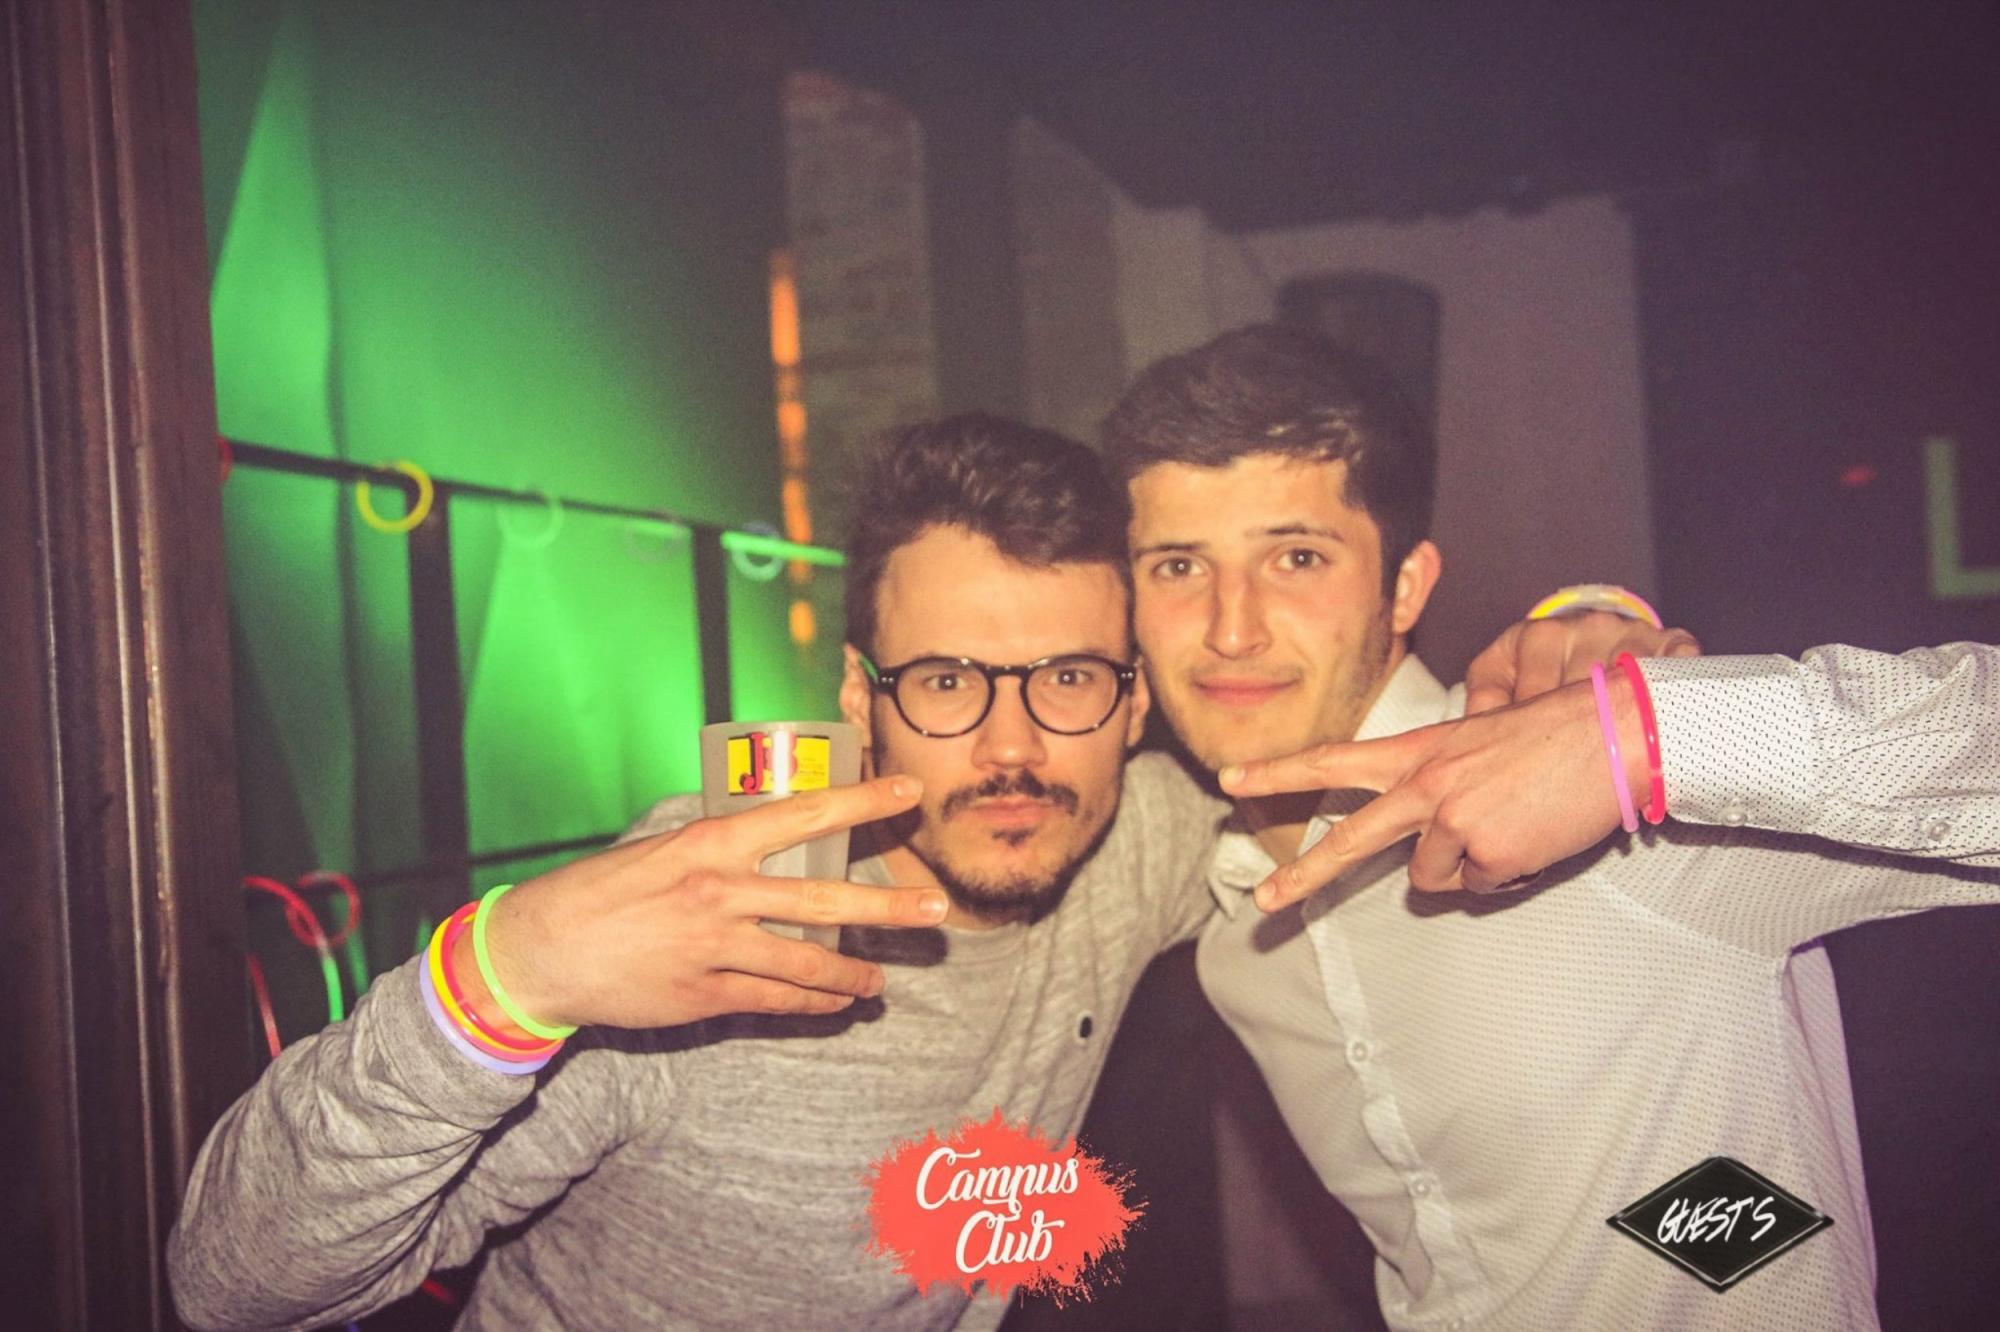 Inter IUT by campus Club - Jeudi 23 Mars 2017 - 029